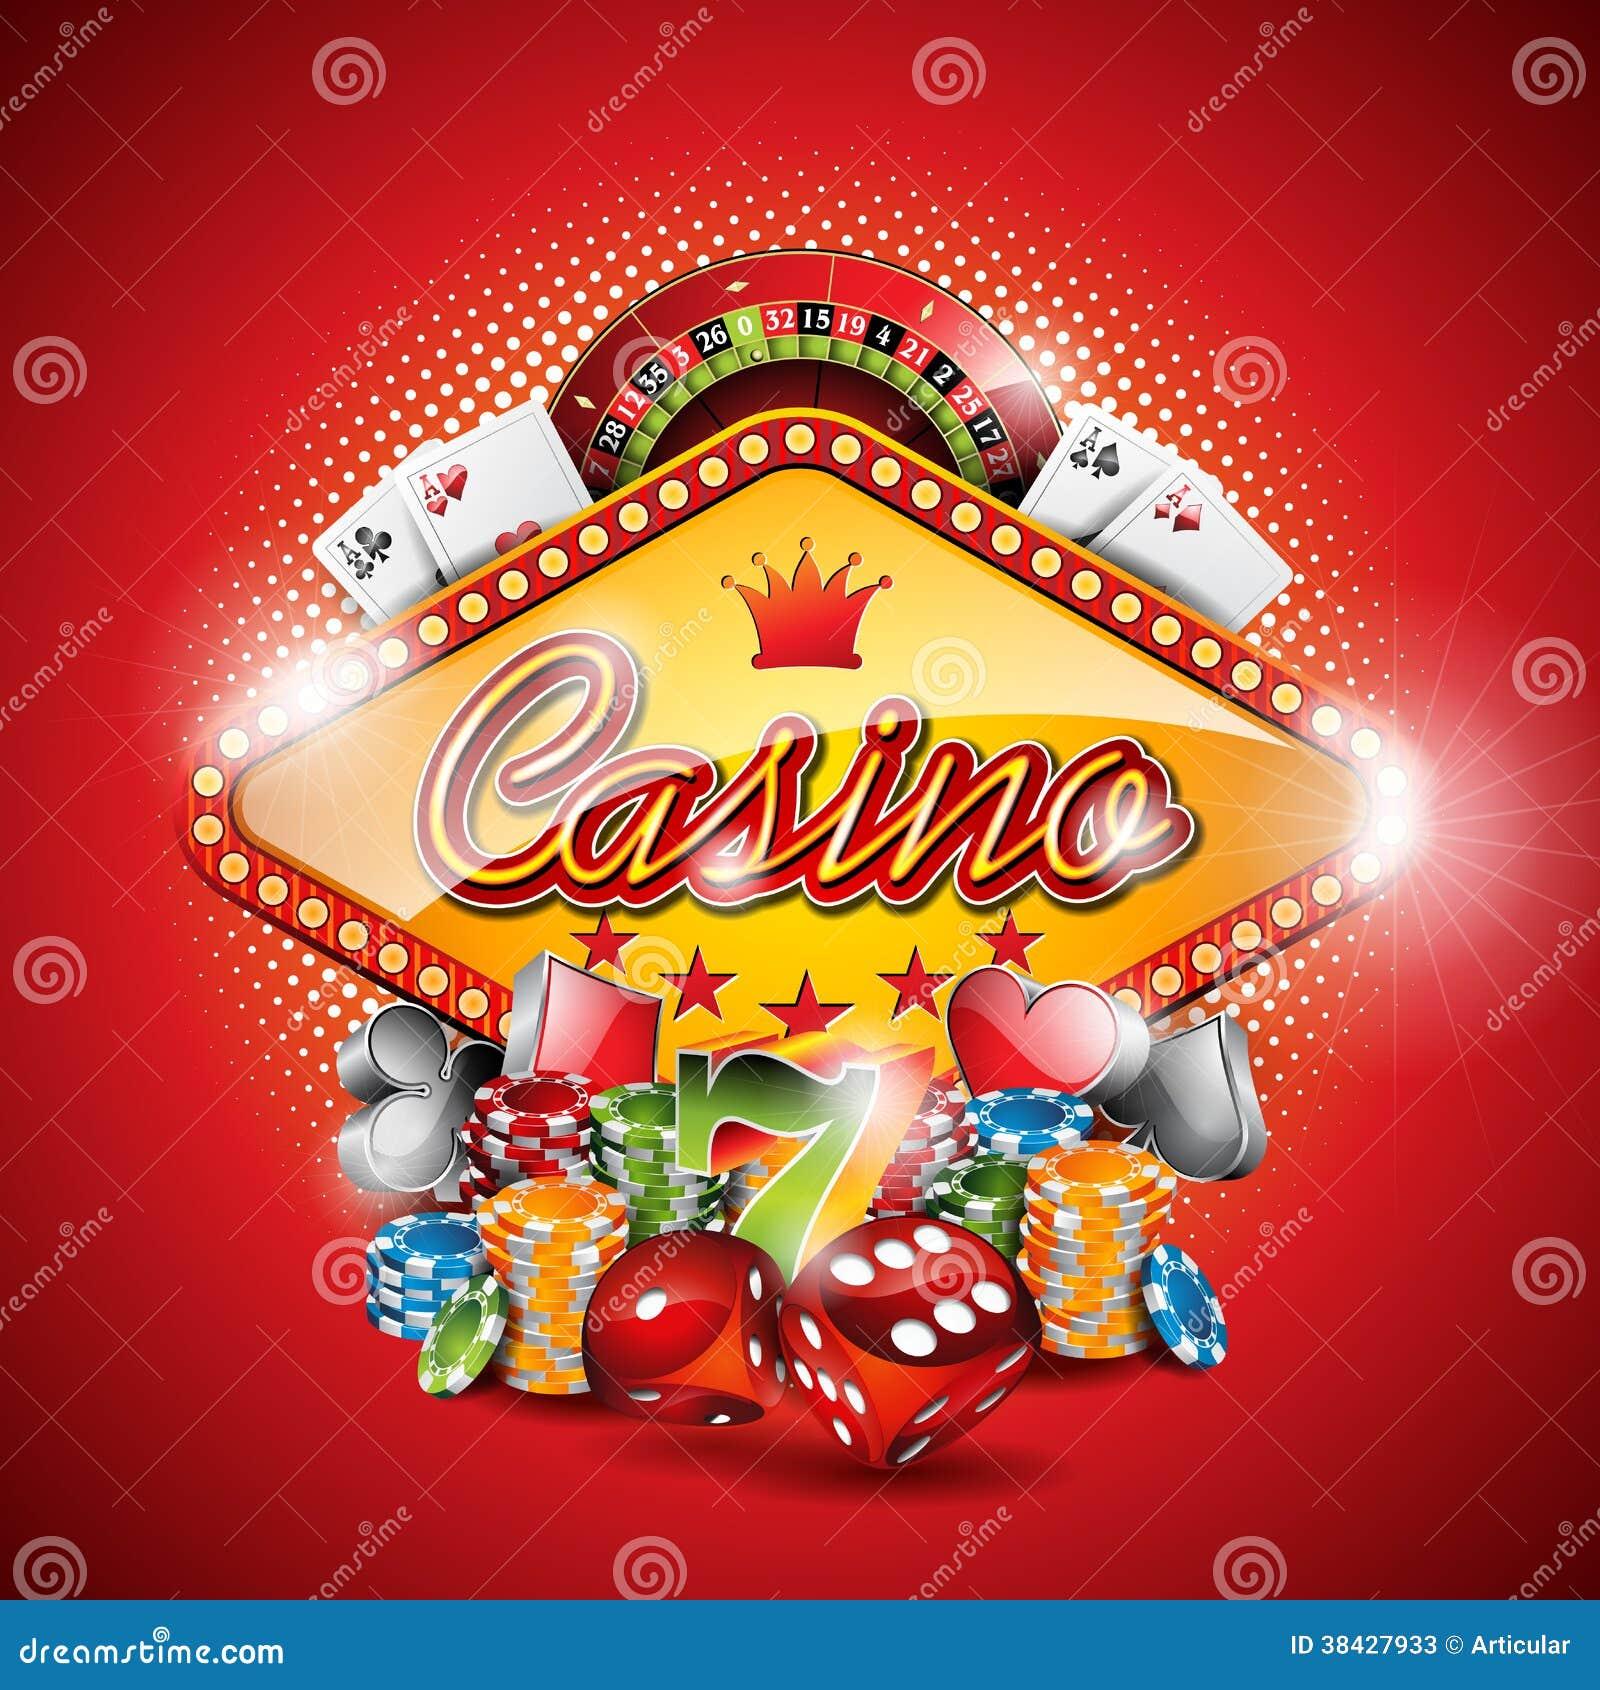 Poker online casino - 52055